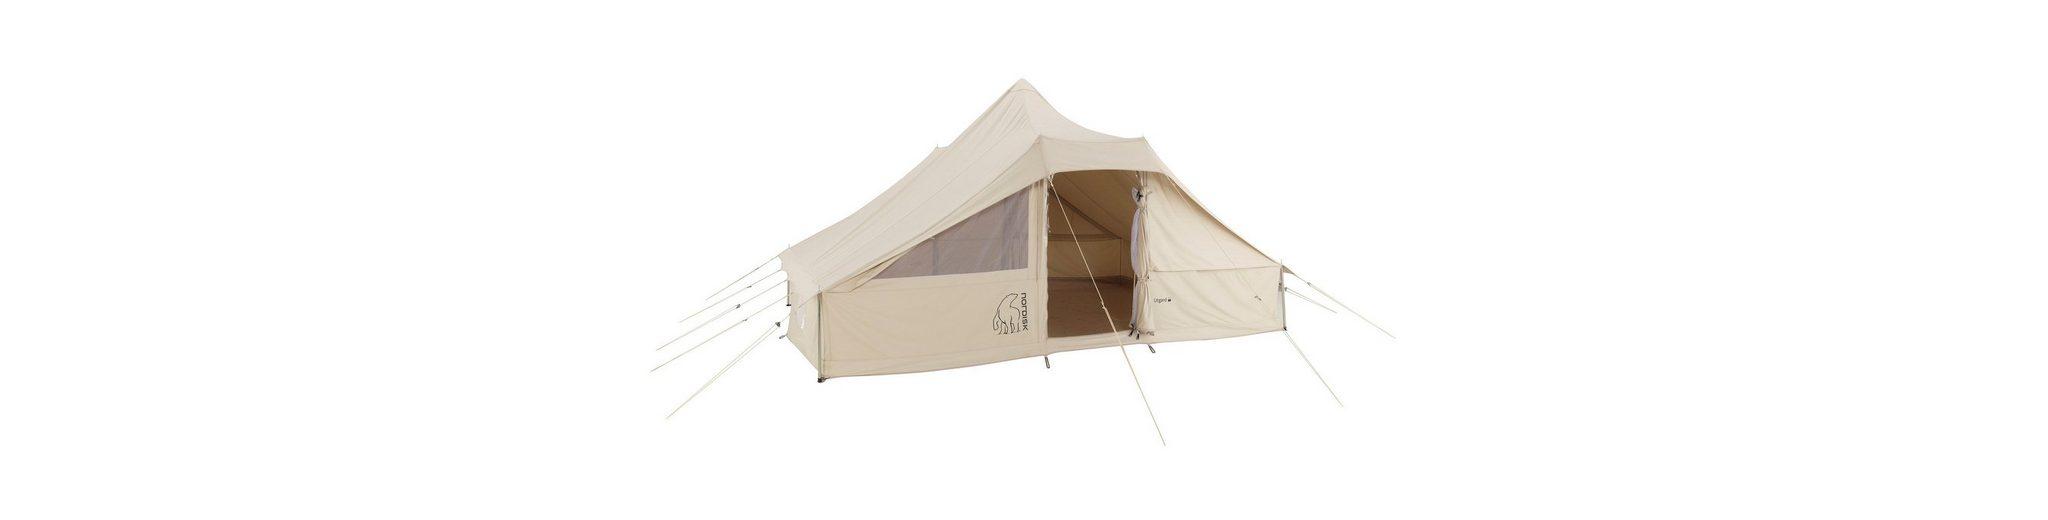 Nordisk Zelt »Utgard 13.2 m² Tent Technical Cotton«